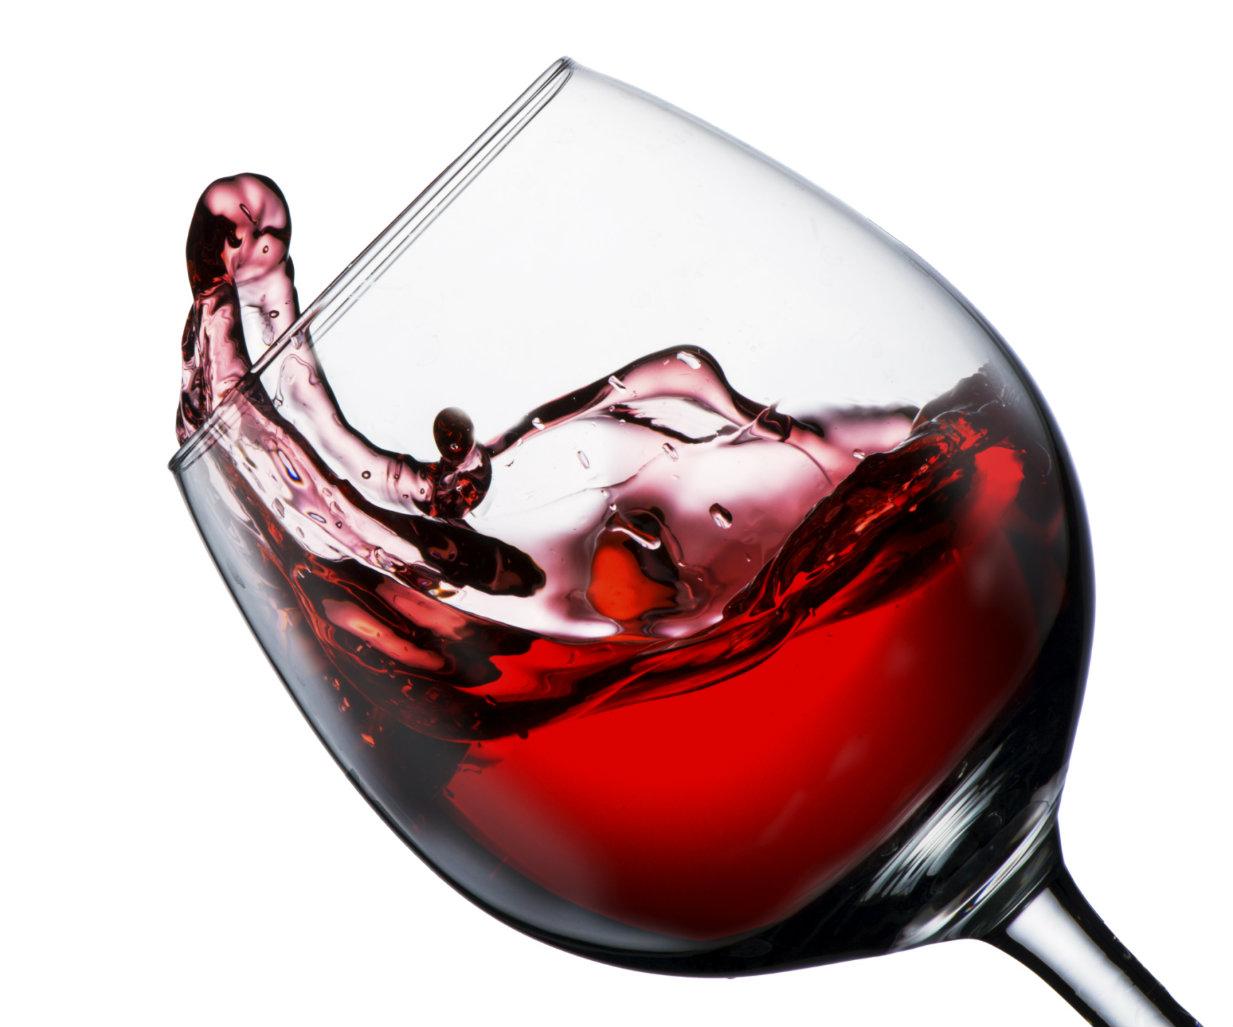 Vin en ligne : accord entre nourriture et vin